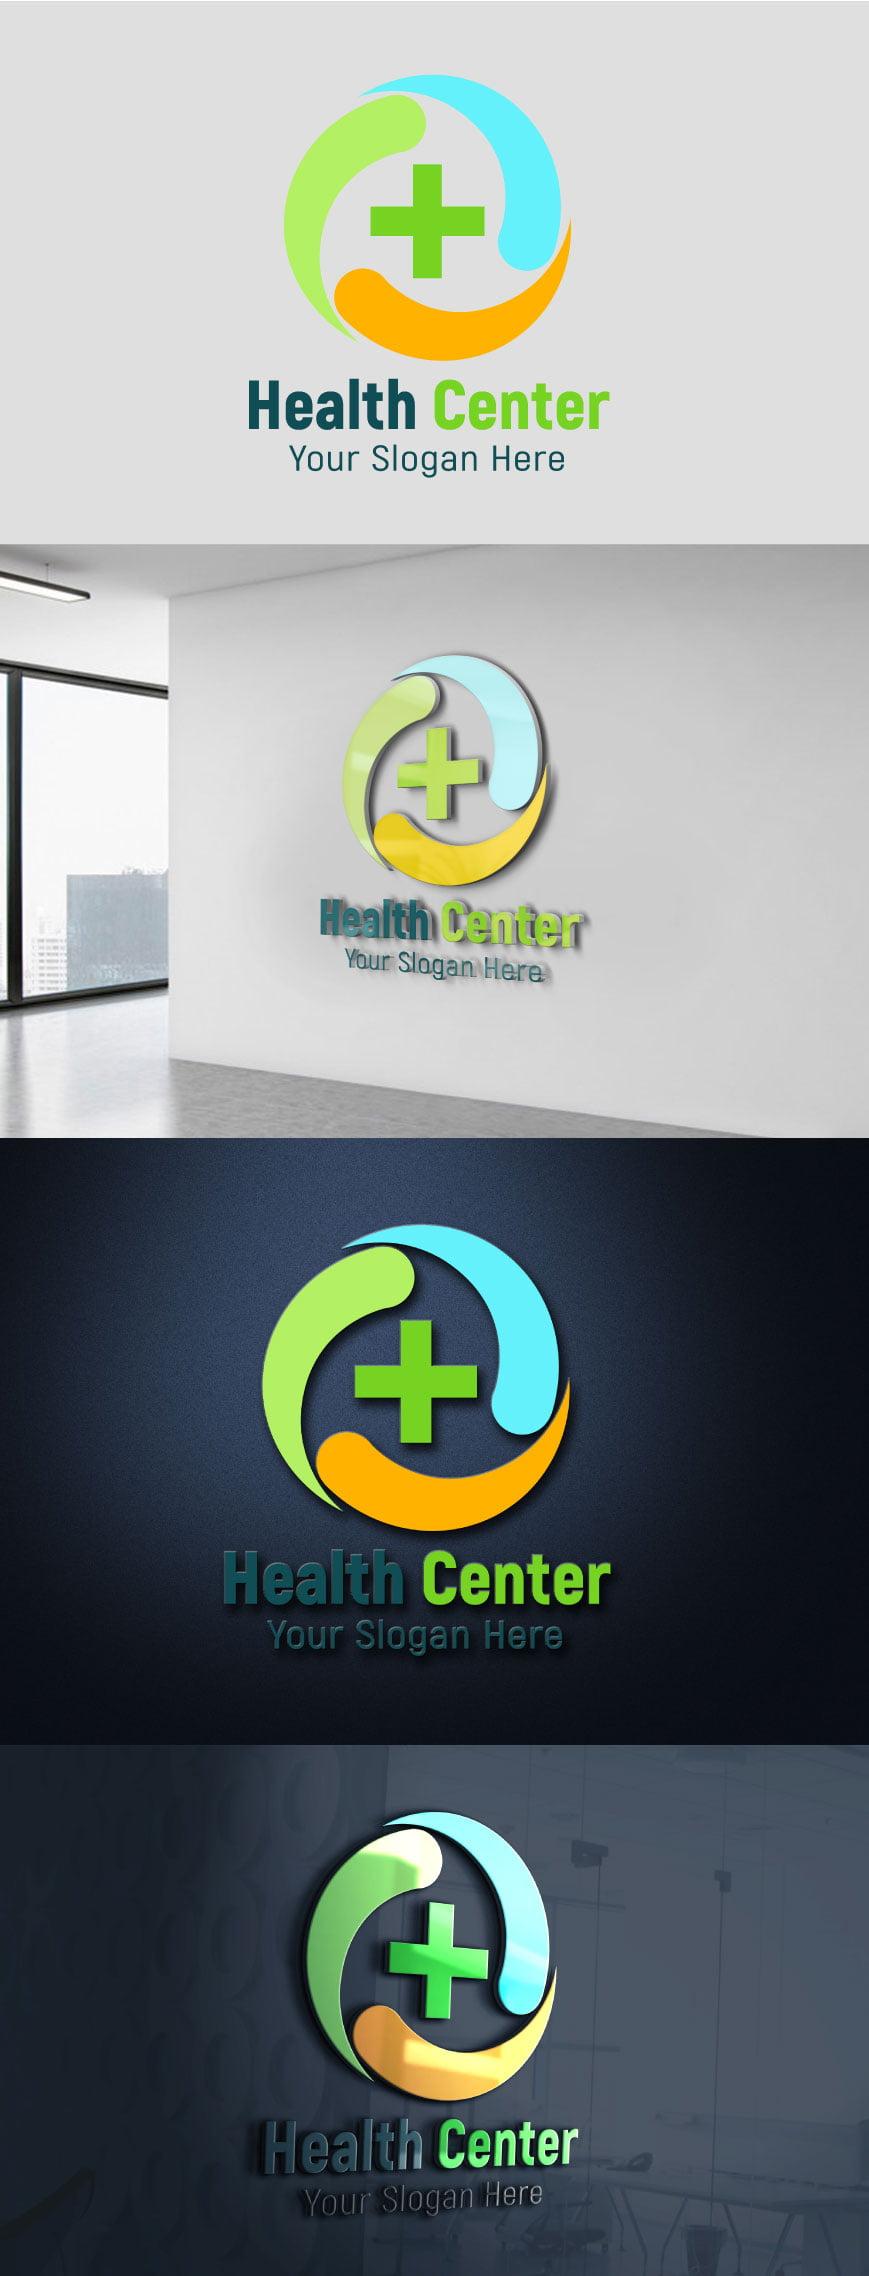 Healthcare Logo Design psd